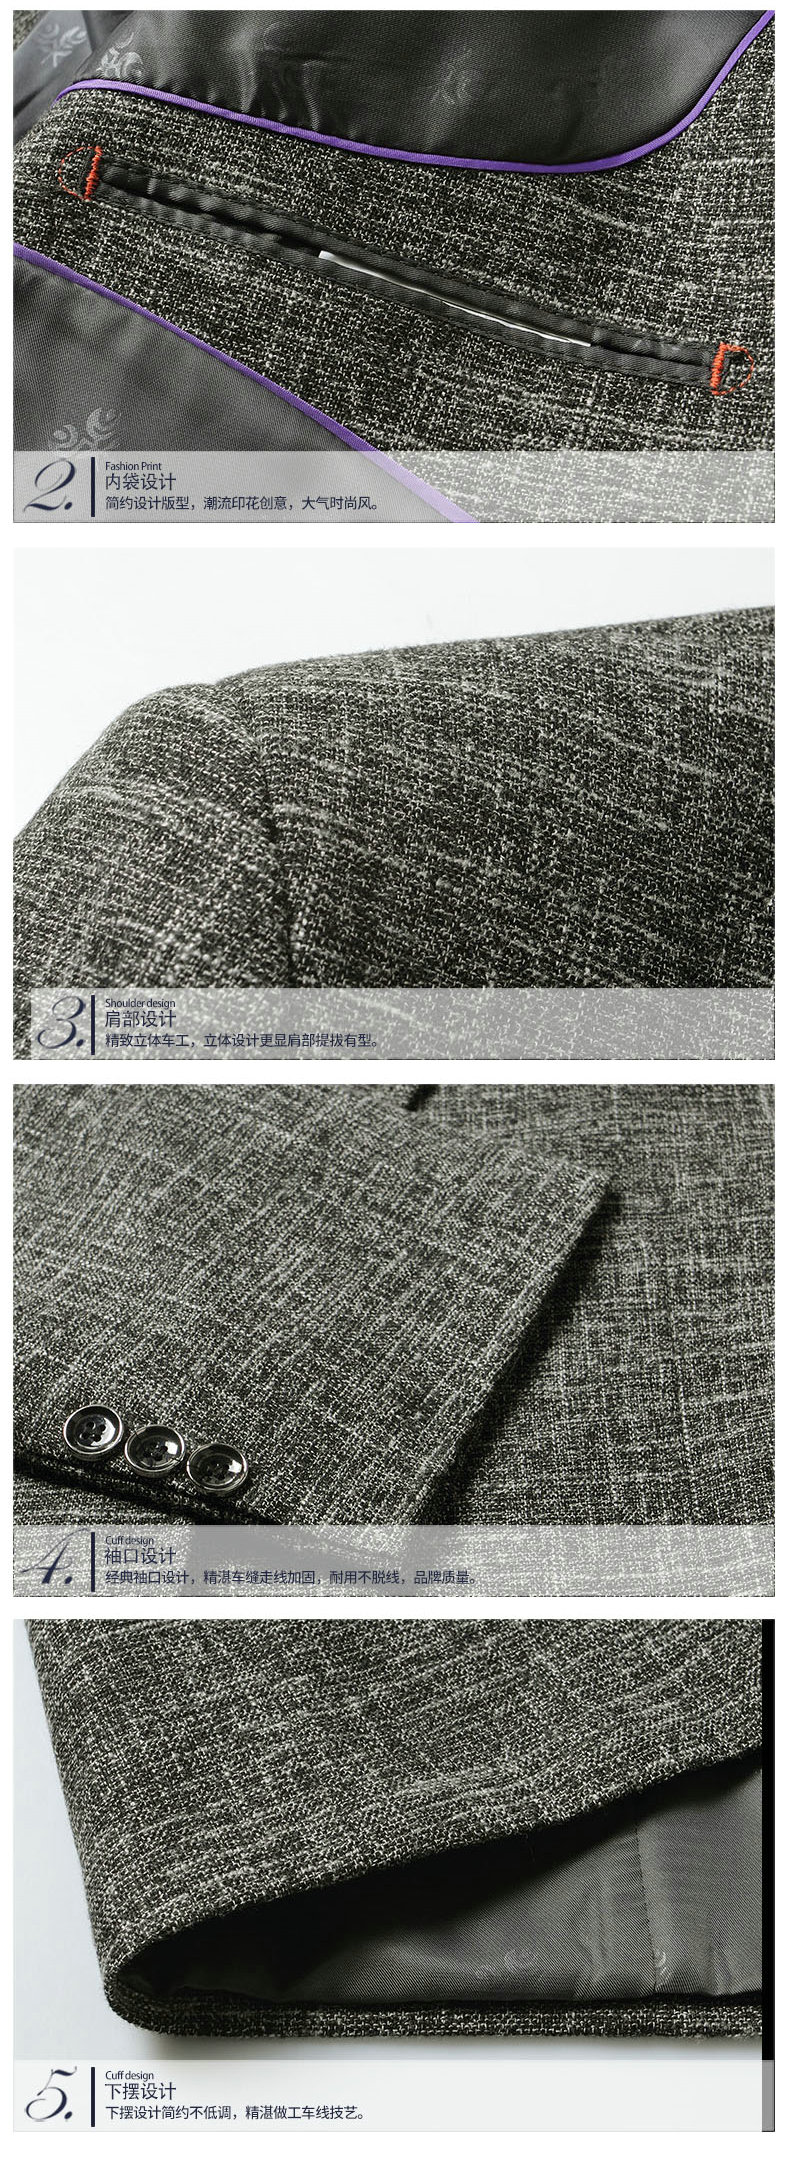 WAEOLSA Men Elegance Blazers Gray Red Khaki Suit Jackets Man Notched Collar Outfits Business Casual Blazer Male Office Suit Jacket Plus Size Wear (1)